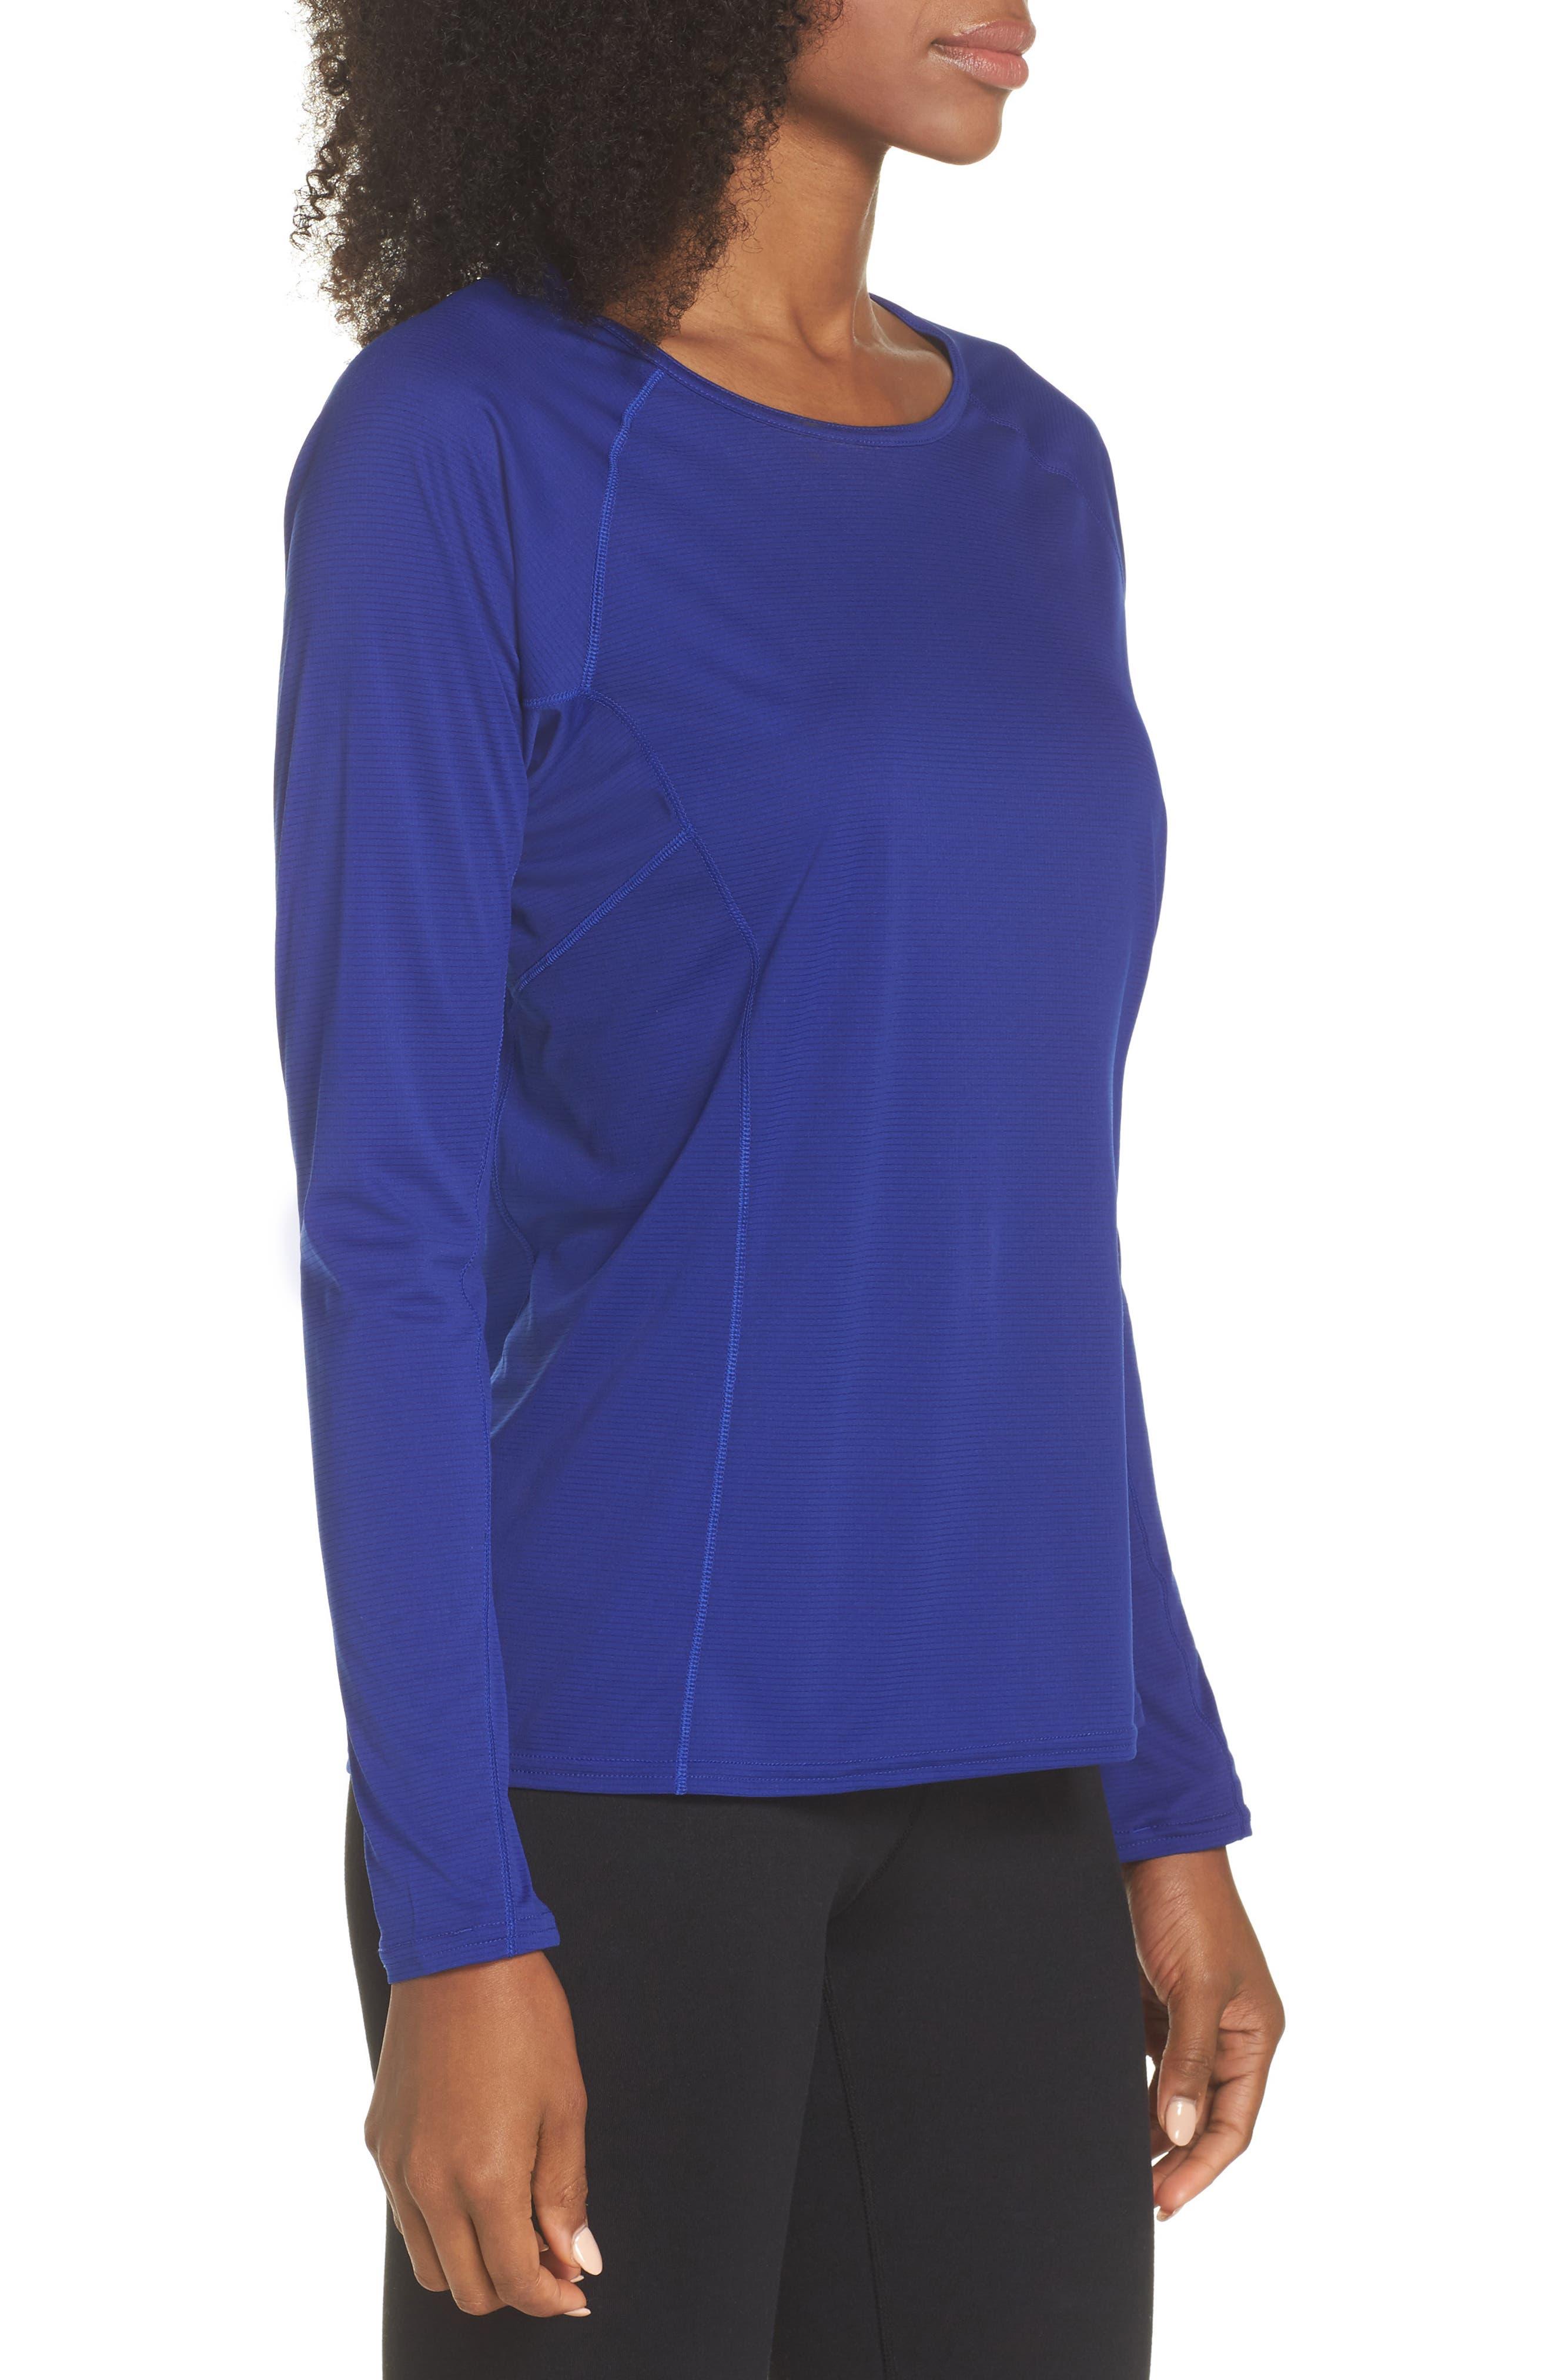 Lightweight Capilene<sup>®</sup> Long-Sleeve Tee,                             Alternate thumbnail 3, color,                             Cobalt Blue